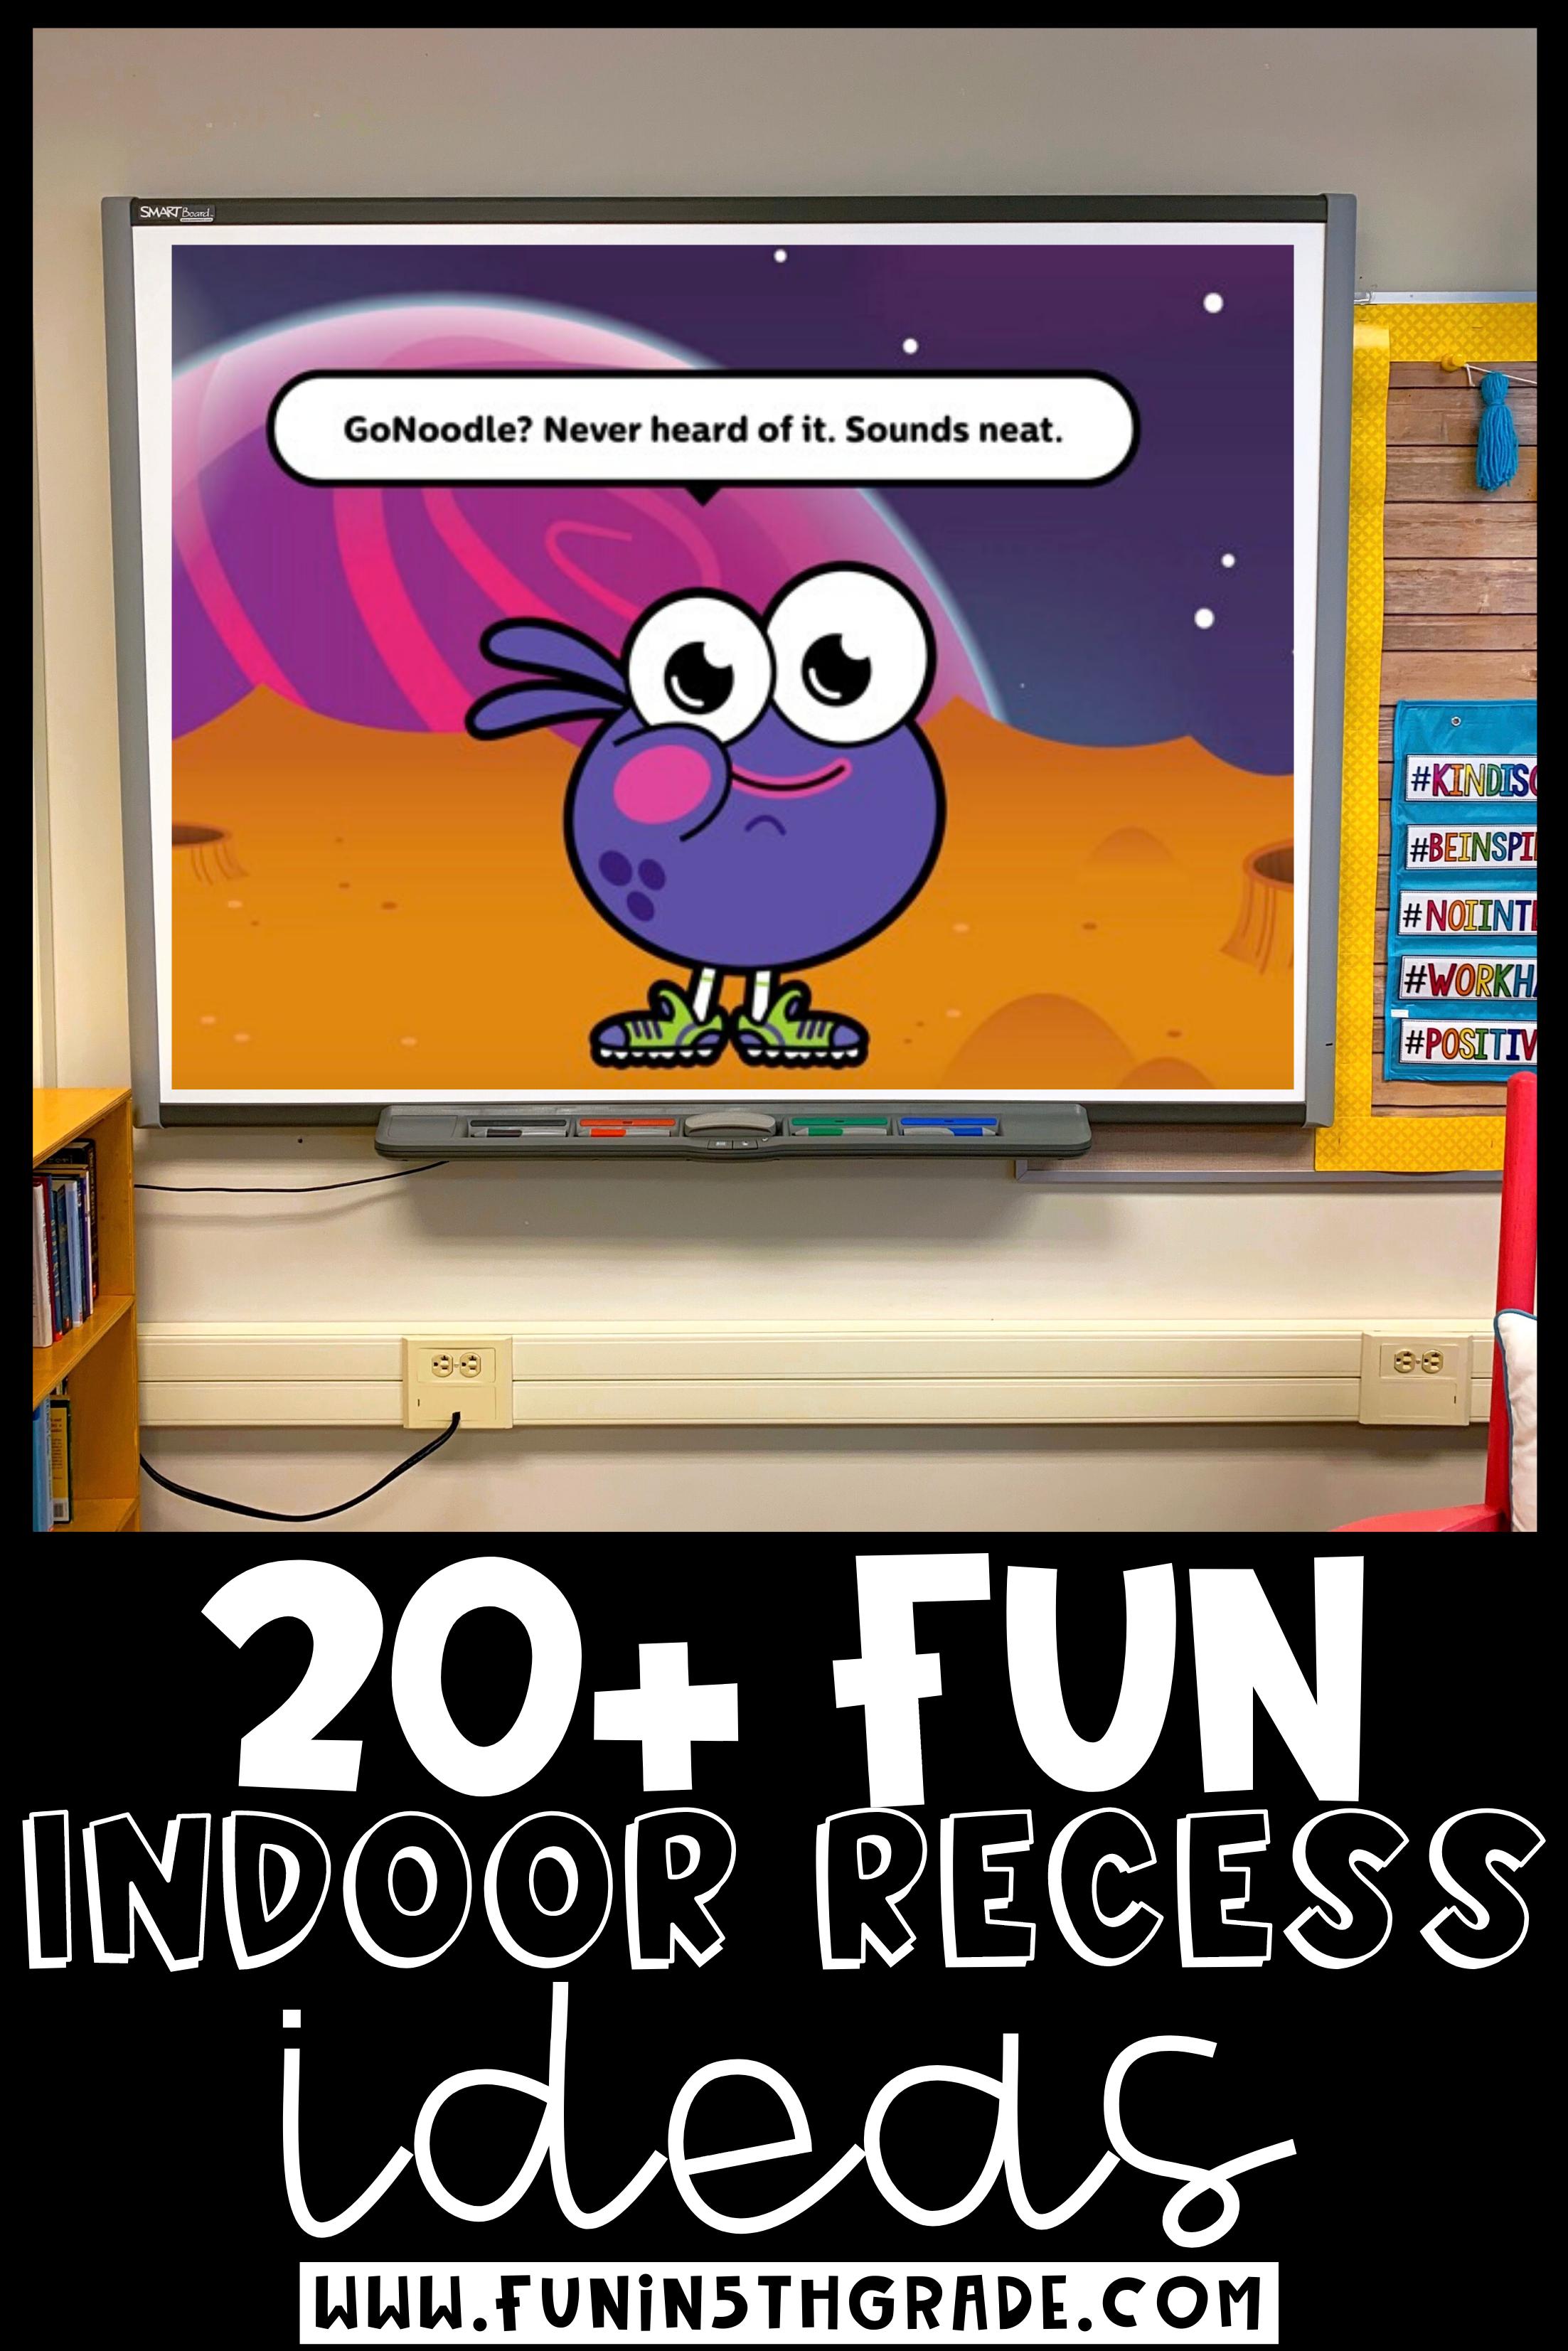 Indoor Recess 20+ FUN Ideas to Save Your Sanity Indoor